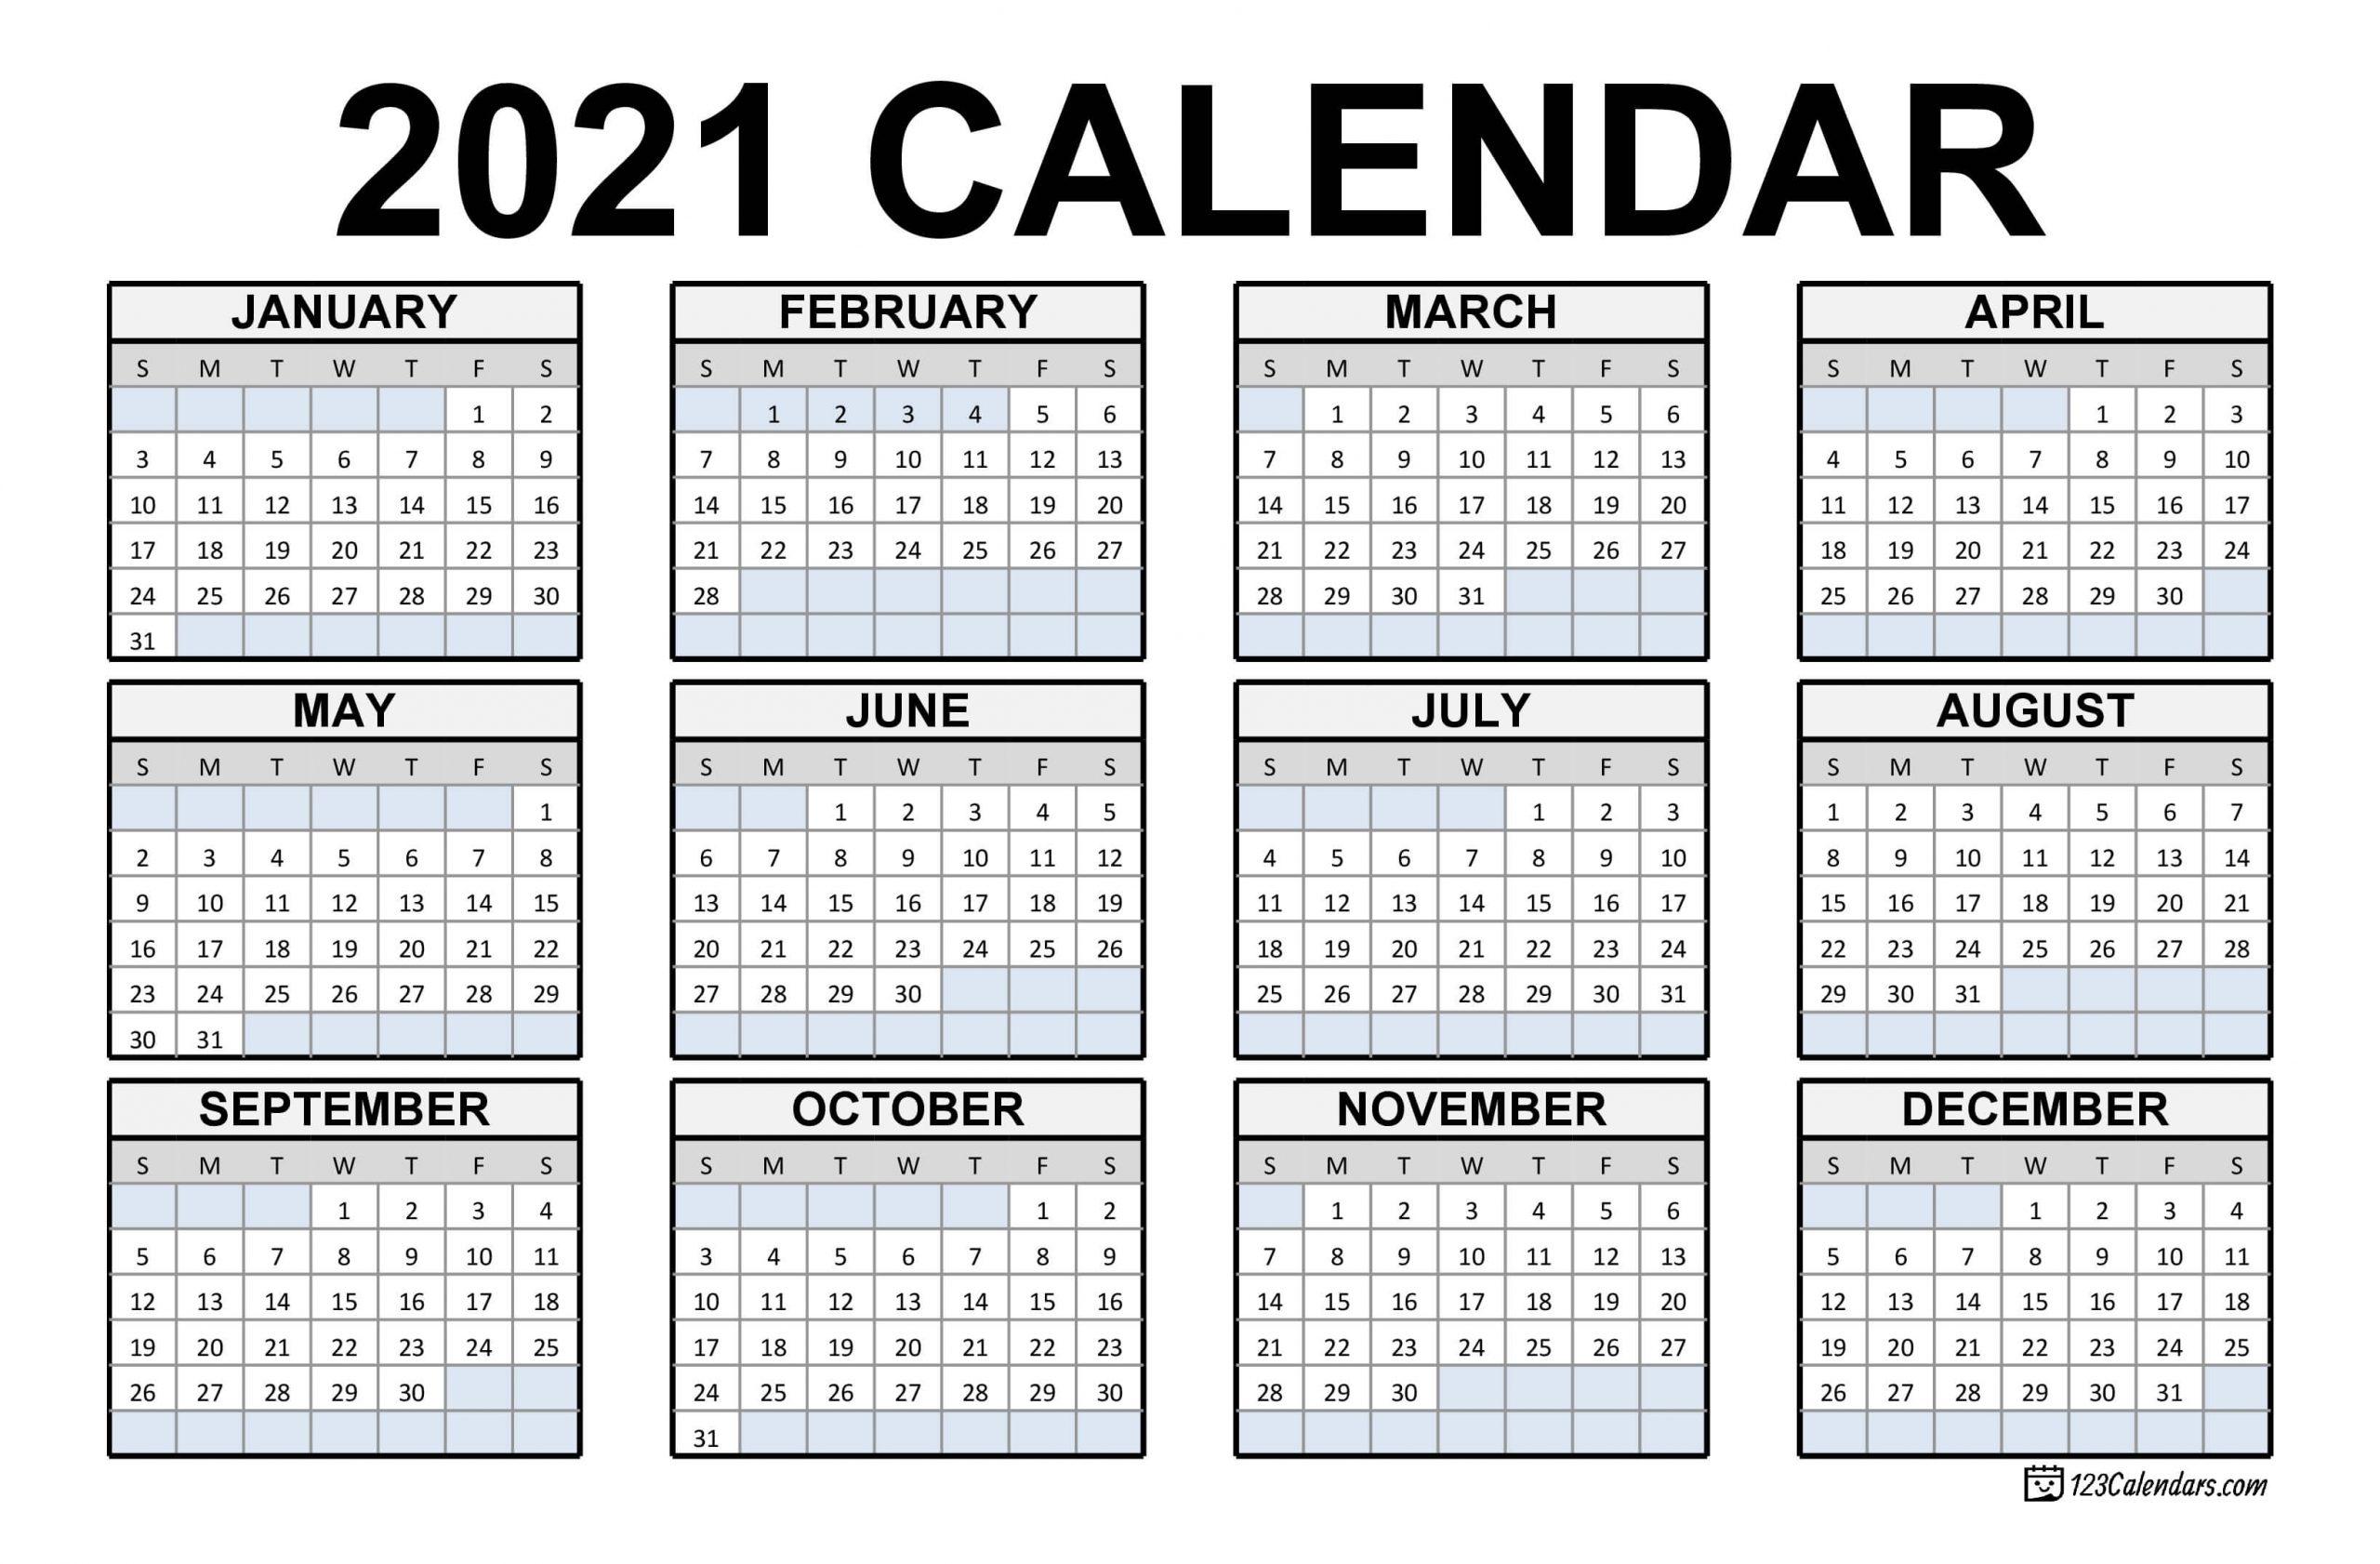 2021 Printable Calendar | 123Calendars for Free Printable Pocket Size Calendar